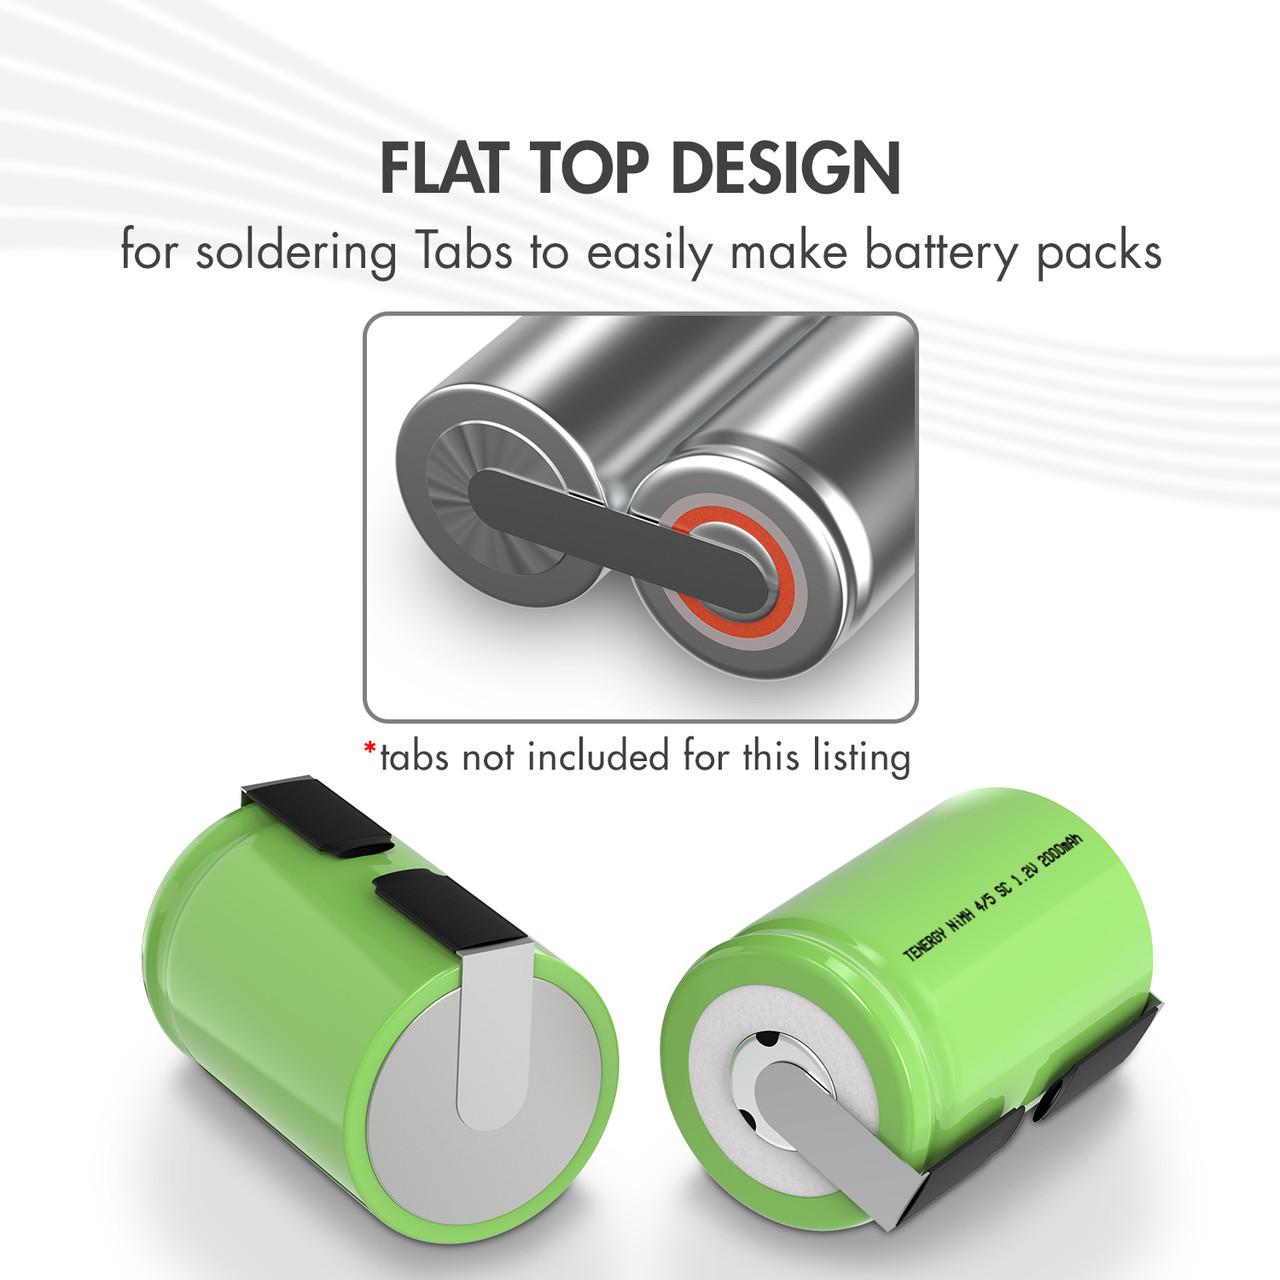 Tenergy 4/5 Sub C 2000mAh NiMH Flat Top Rechargeable Battery